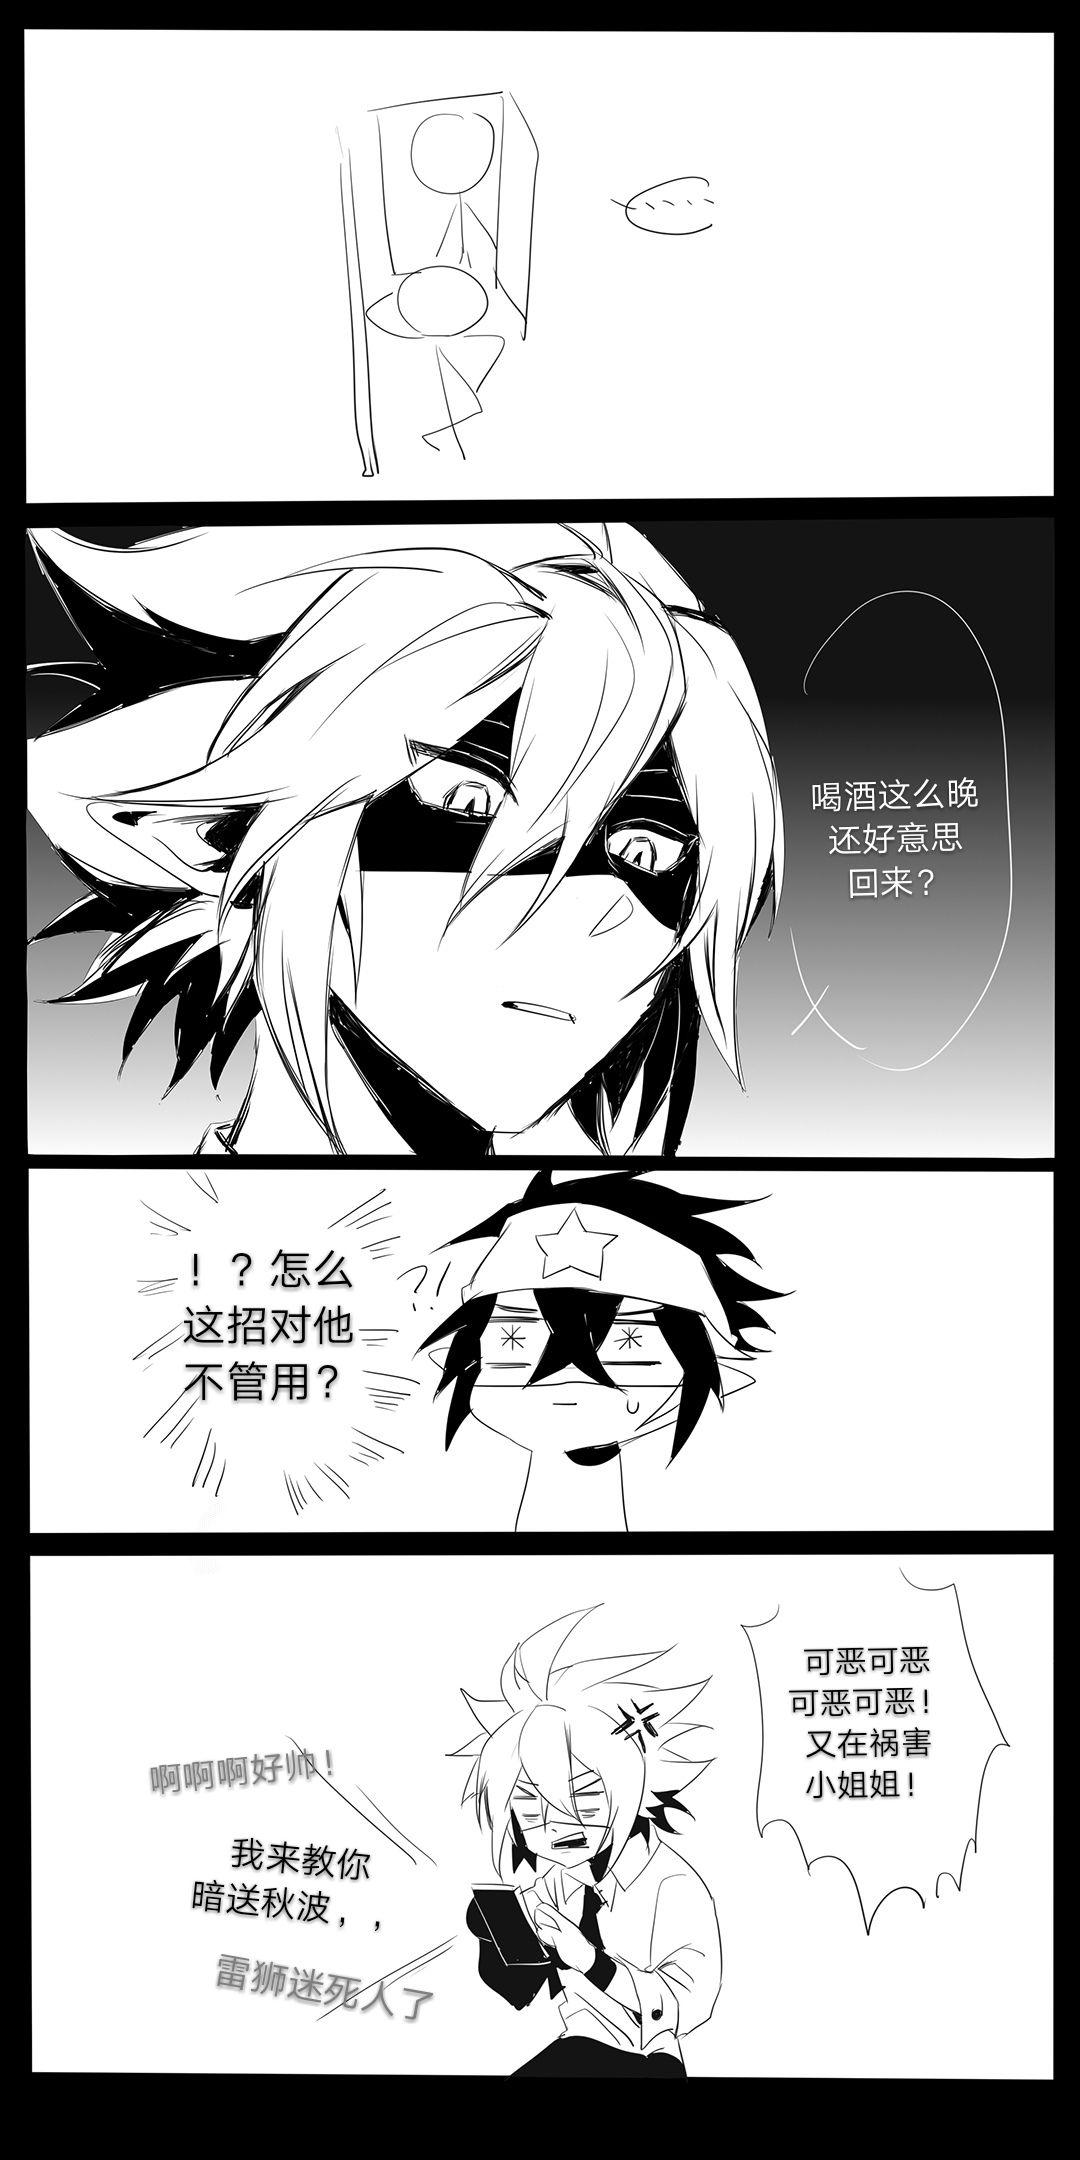 Pin by Tea Cat 猫茶 on Aotu World 凹凸世界 World, Poster, Anime